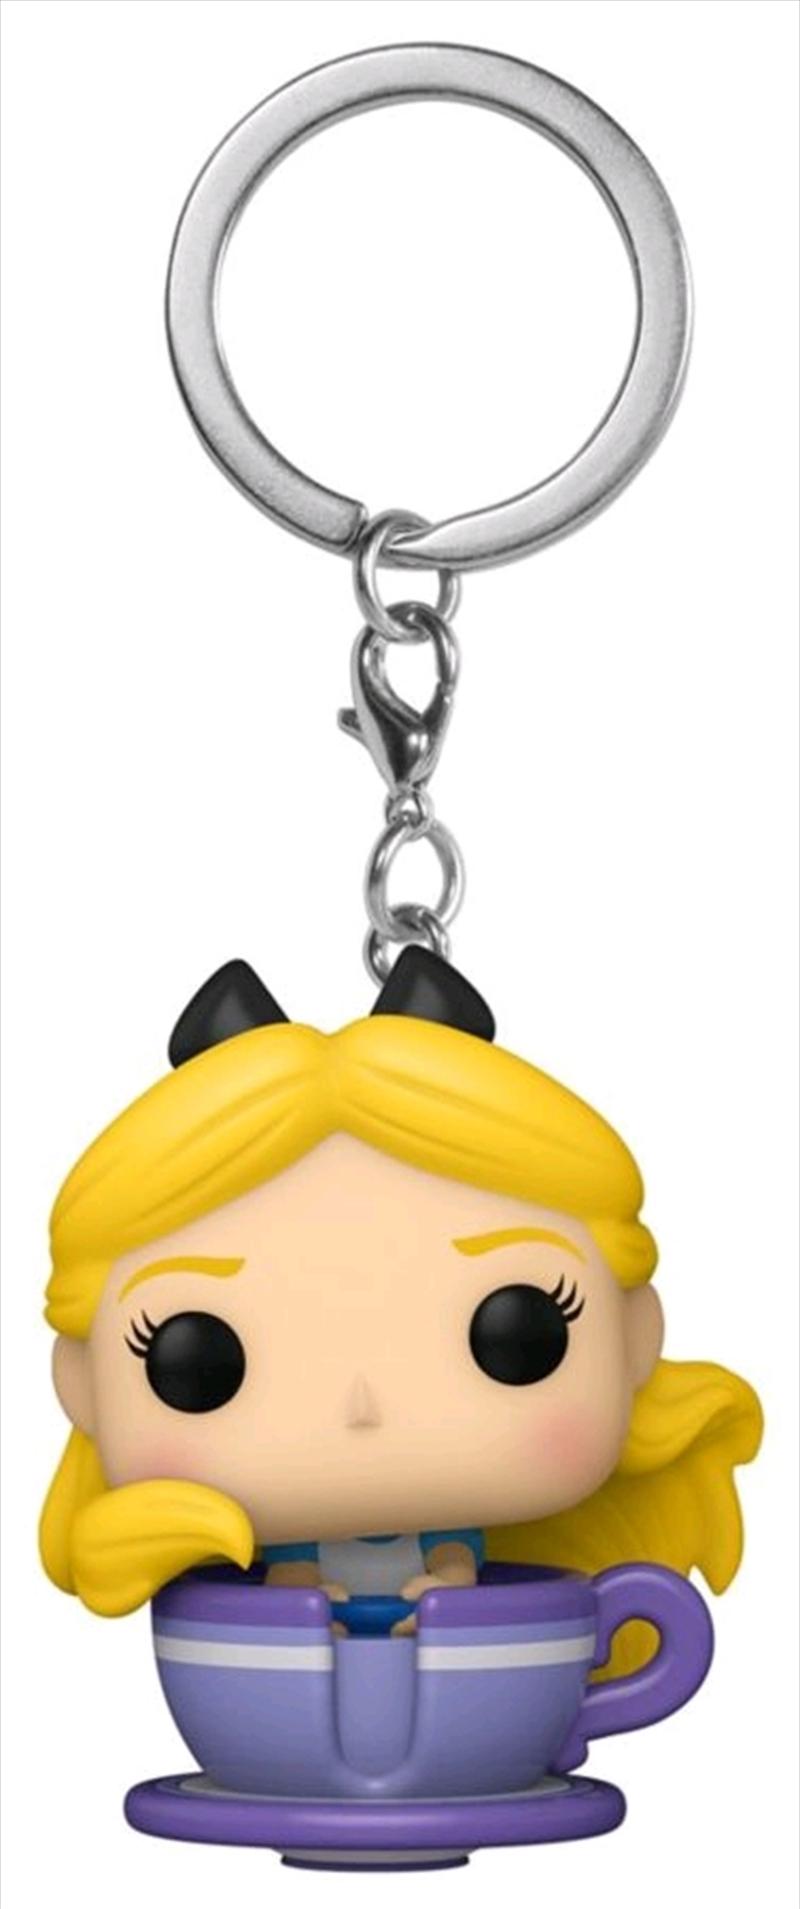 Disneyland 65th Anniversary - Alice in Teacup Pocket Pop! Keychain | Pop Vinyl